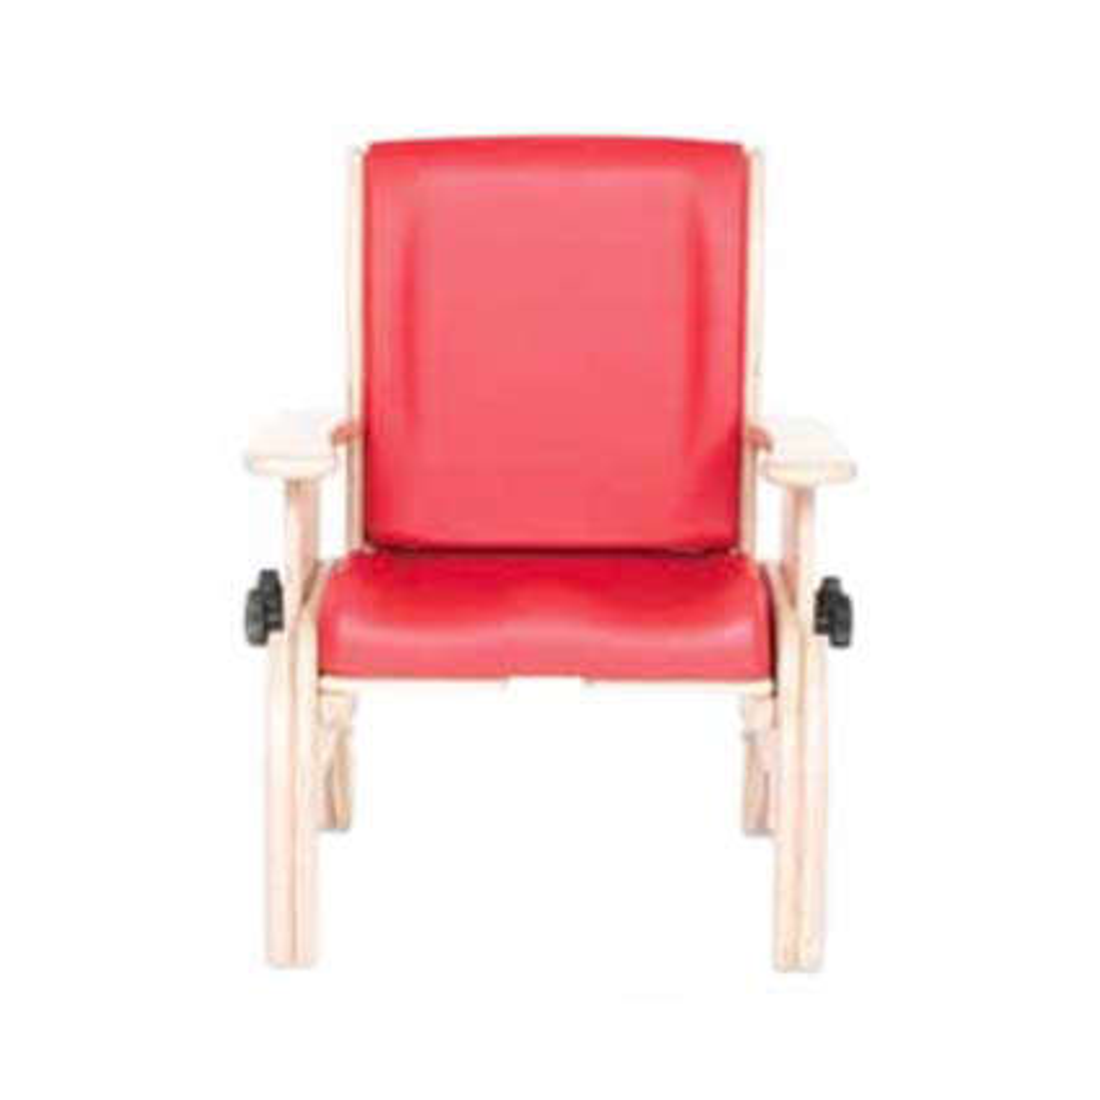 Smirthwaite Juni   JUNI Classroom Chair (16031) by Smirthwaite